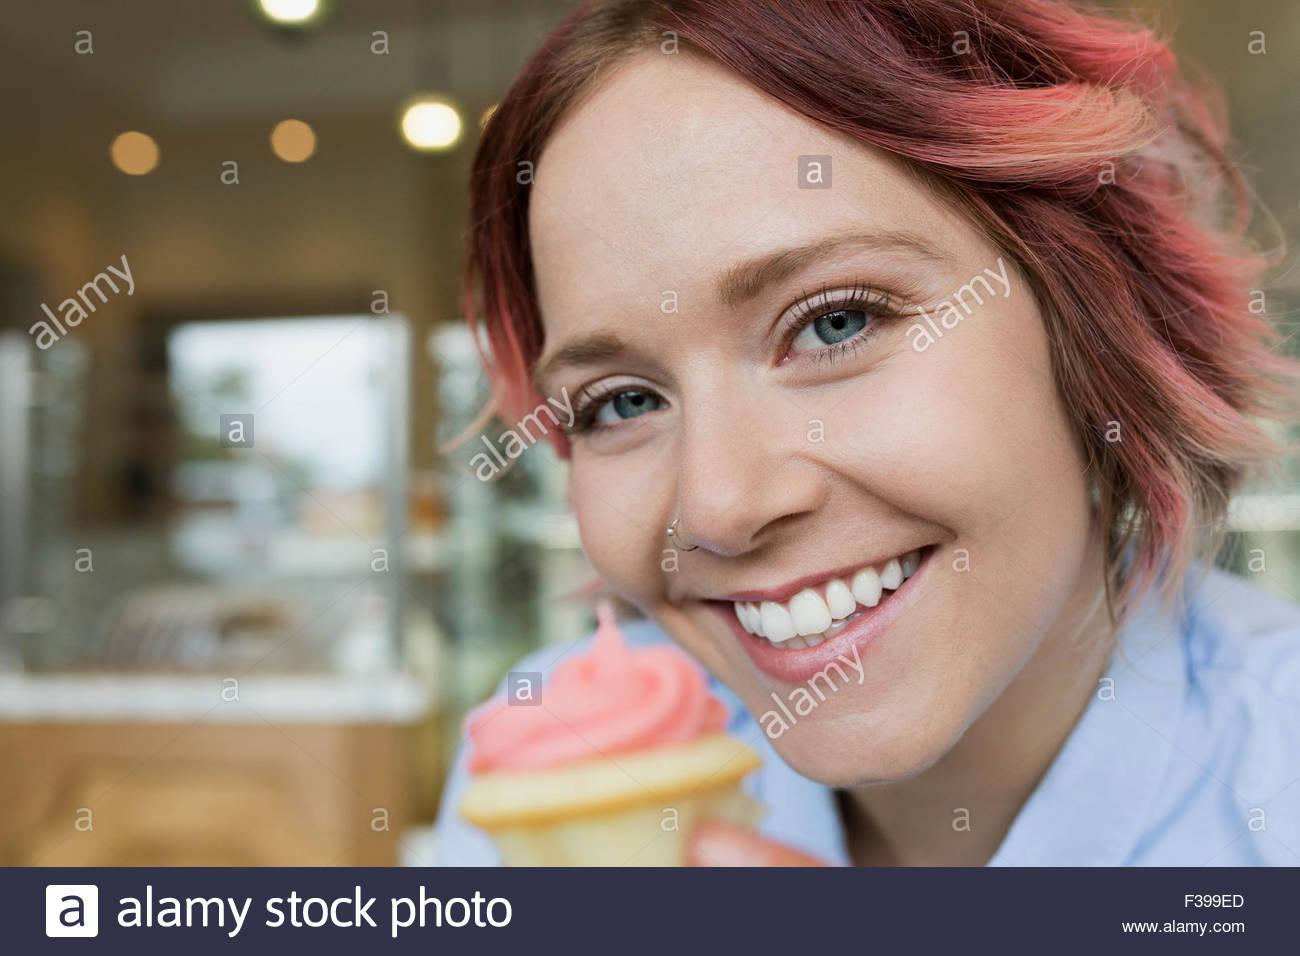 Nahaufnahme Hochformat lächelnde Frau mit rosa cupcake Stockbild